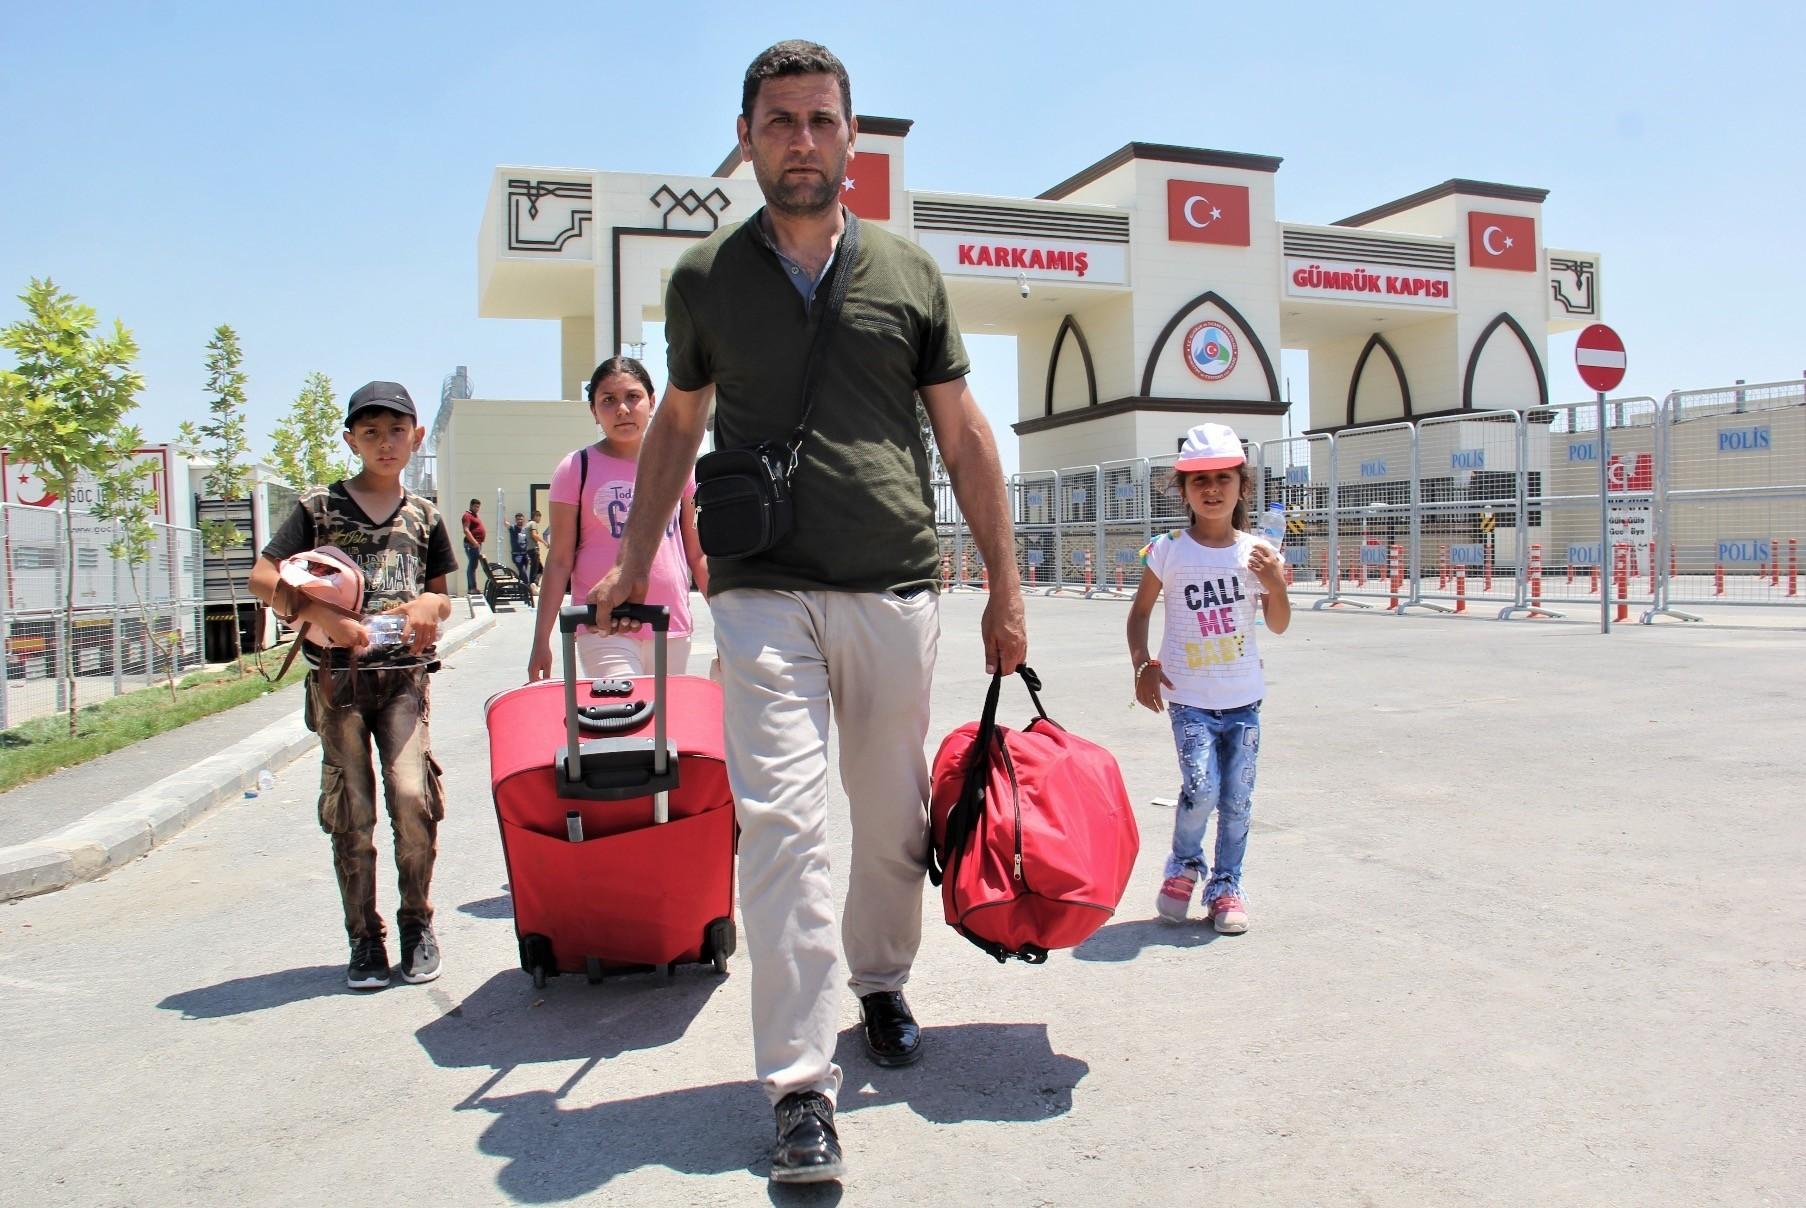 A Syrian man and three children cross into Turkey from the Karkamu0131u015f crossing.